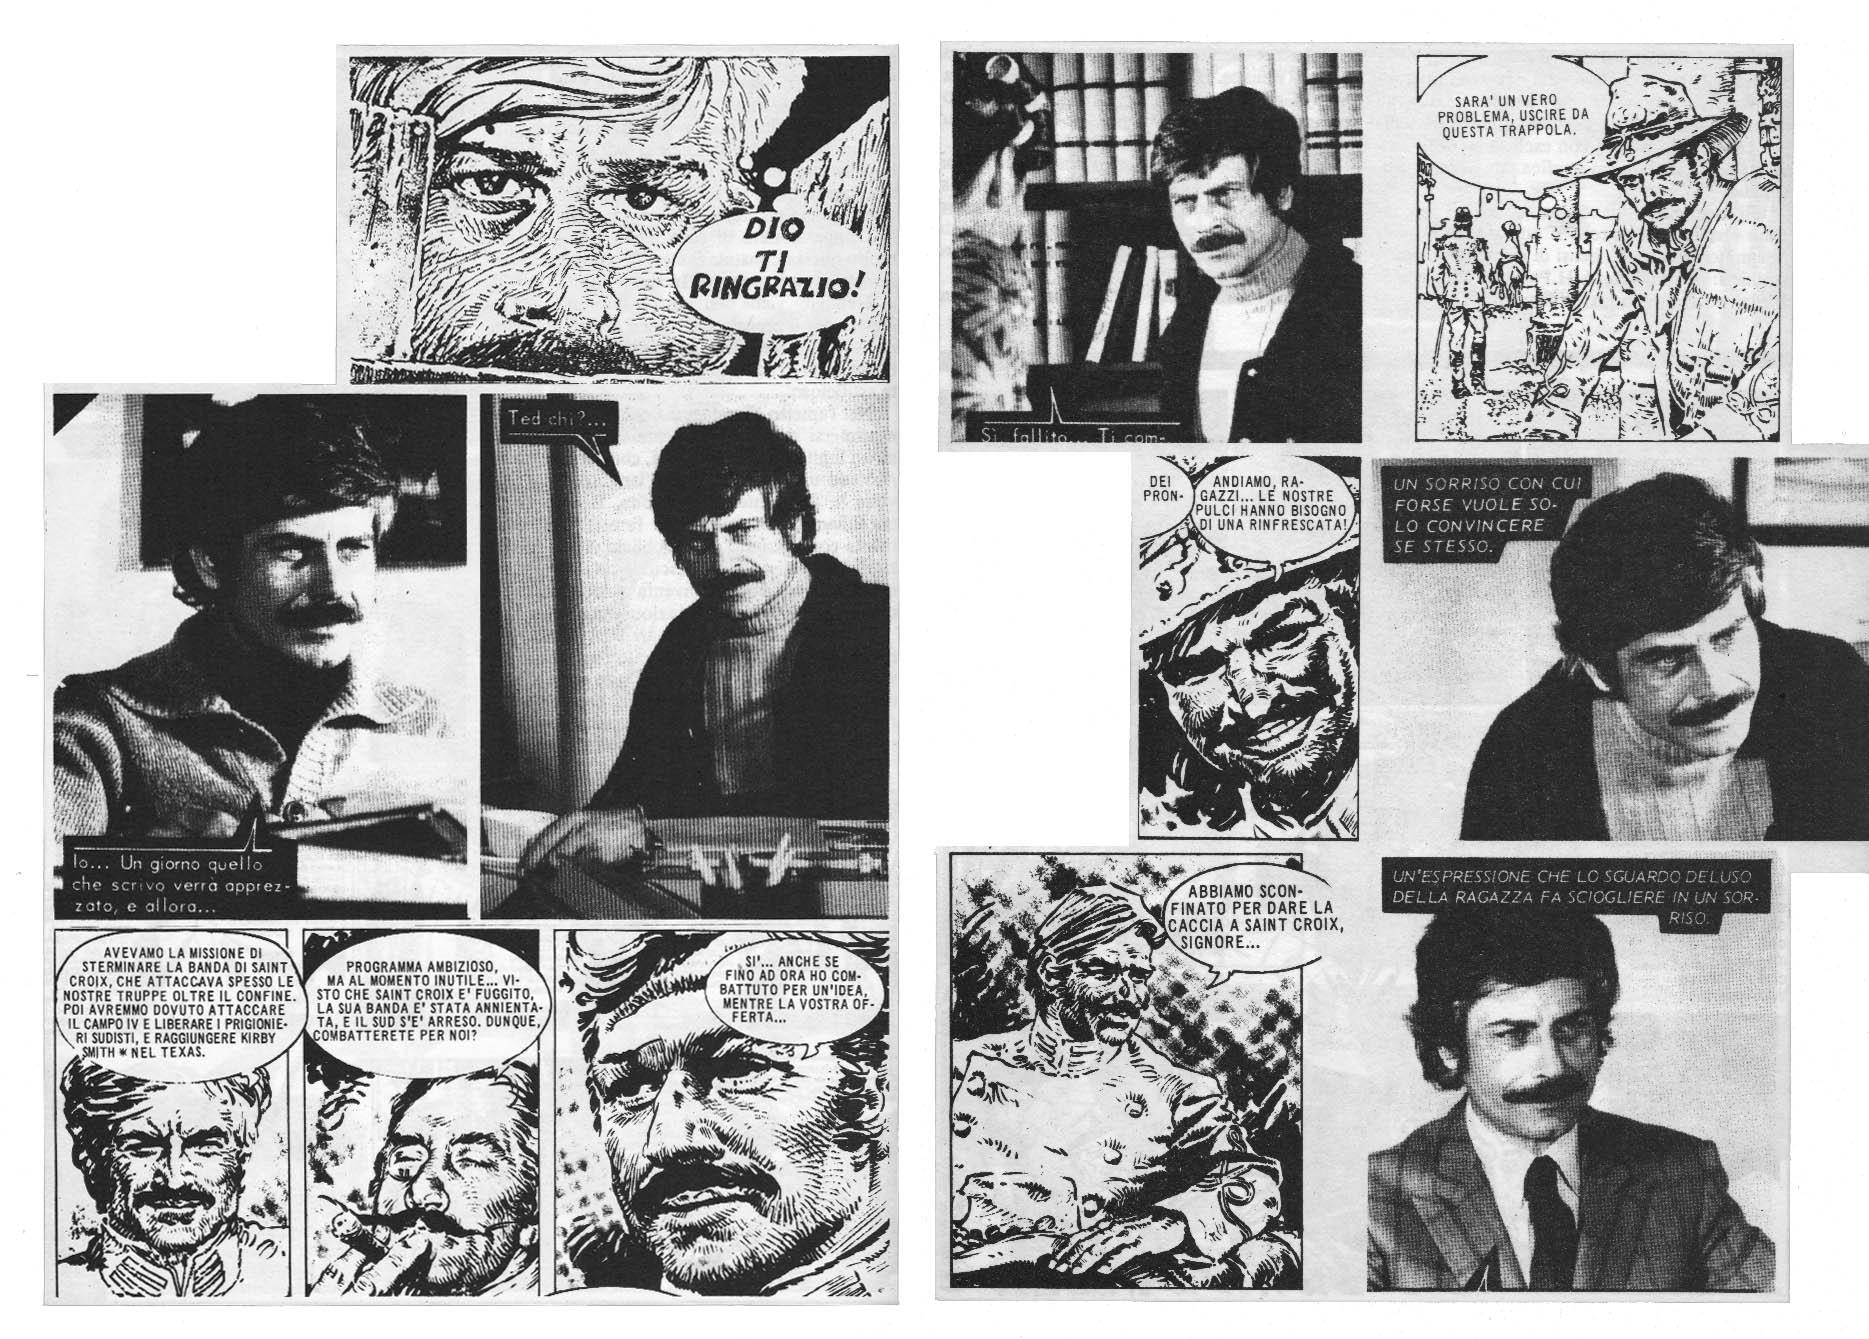 From Fotoromanzi to McCoy's comics by Palacios